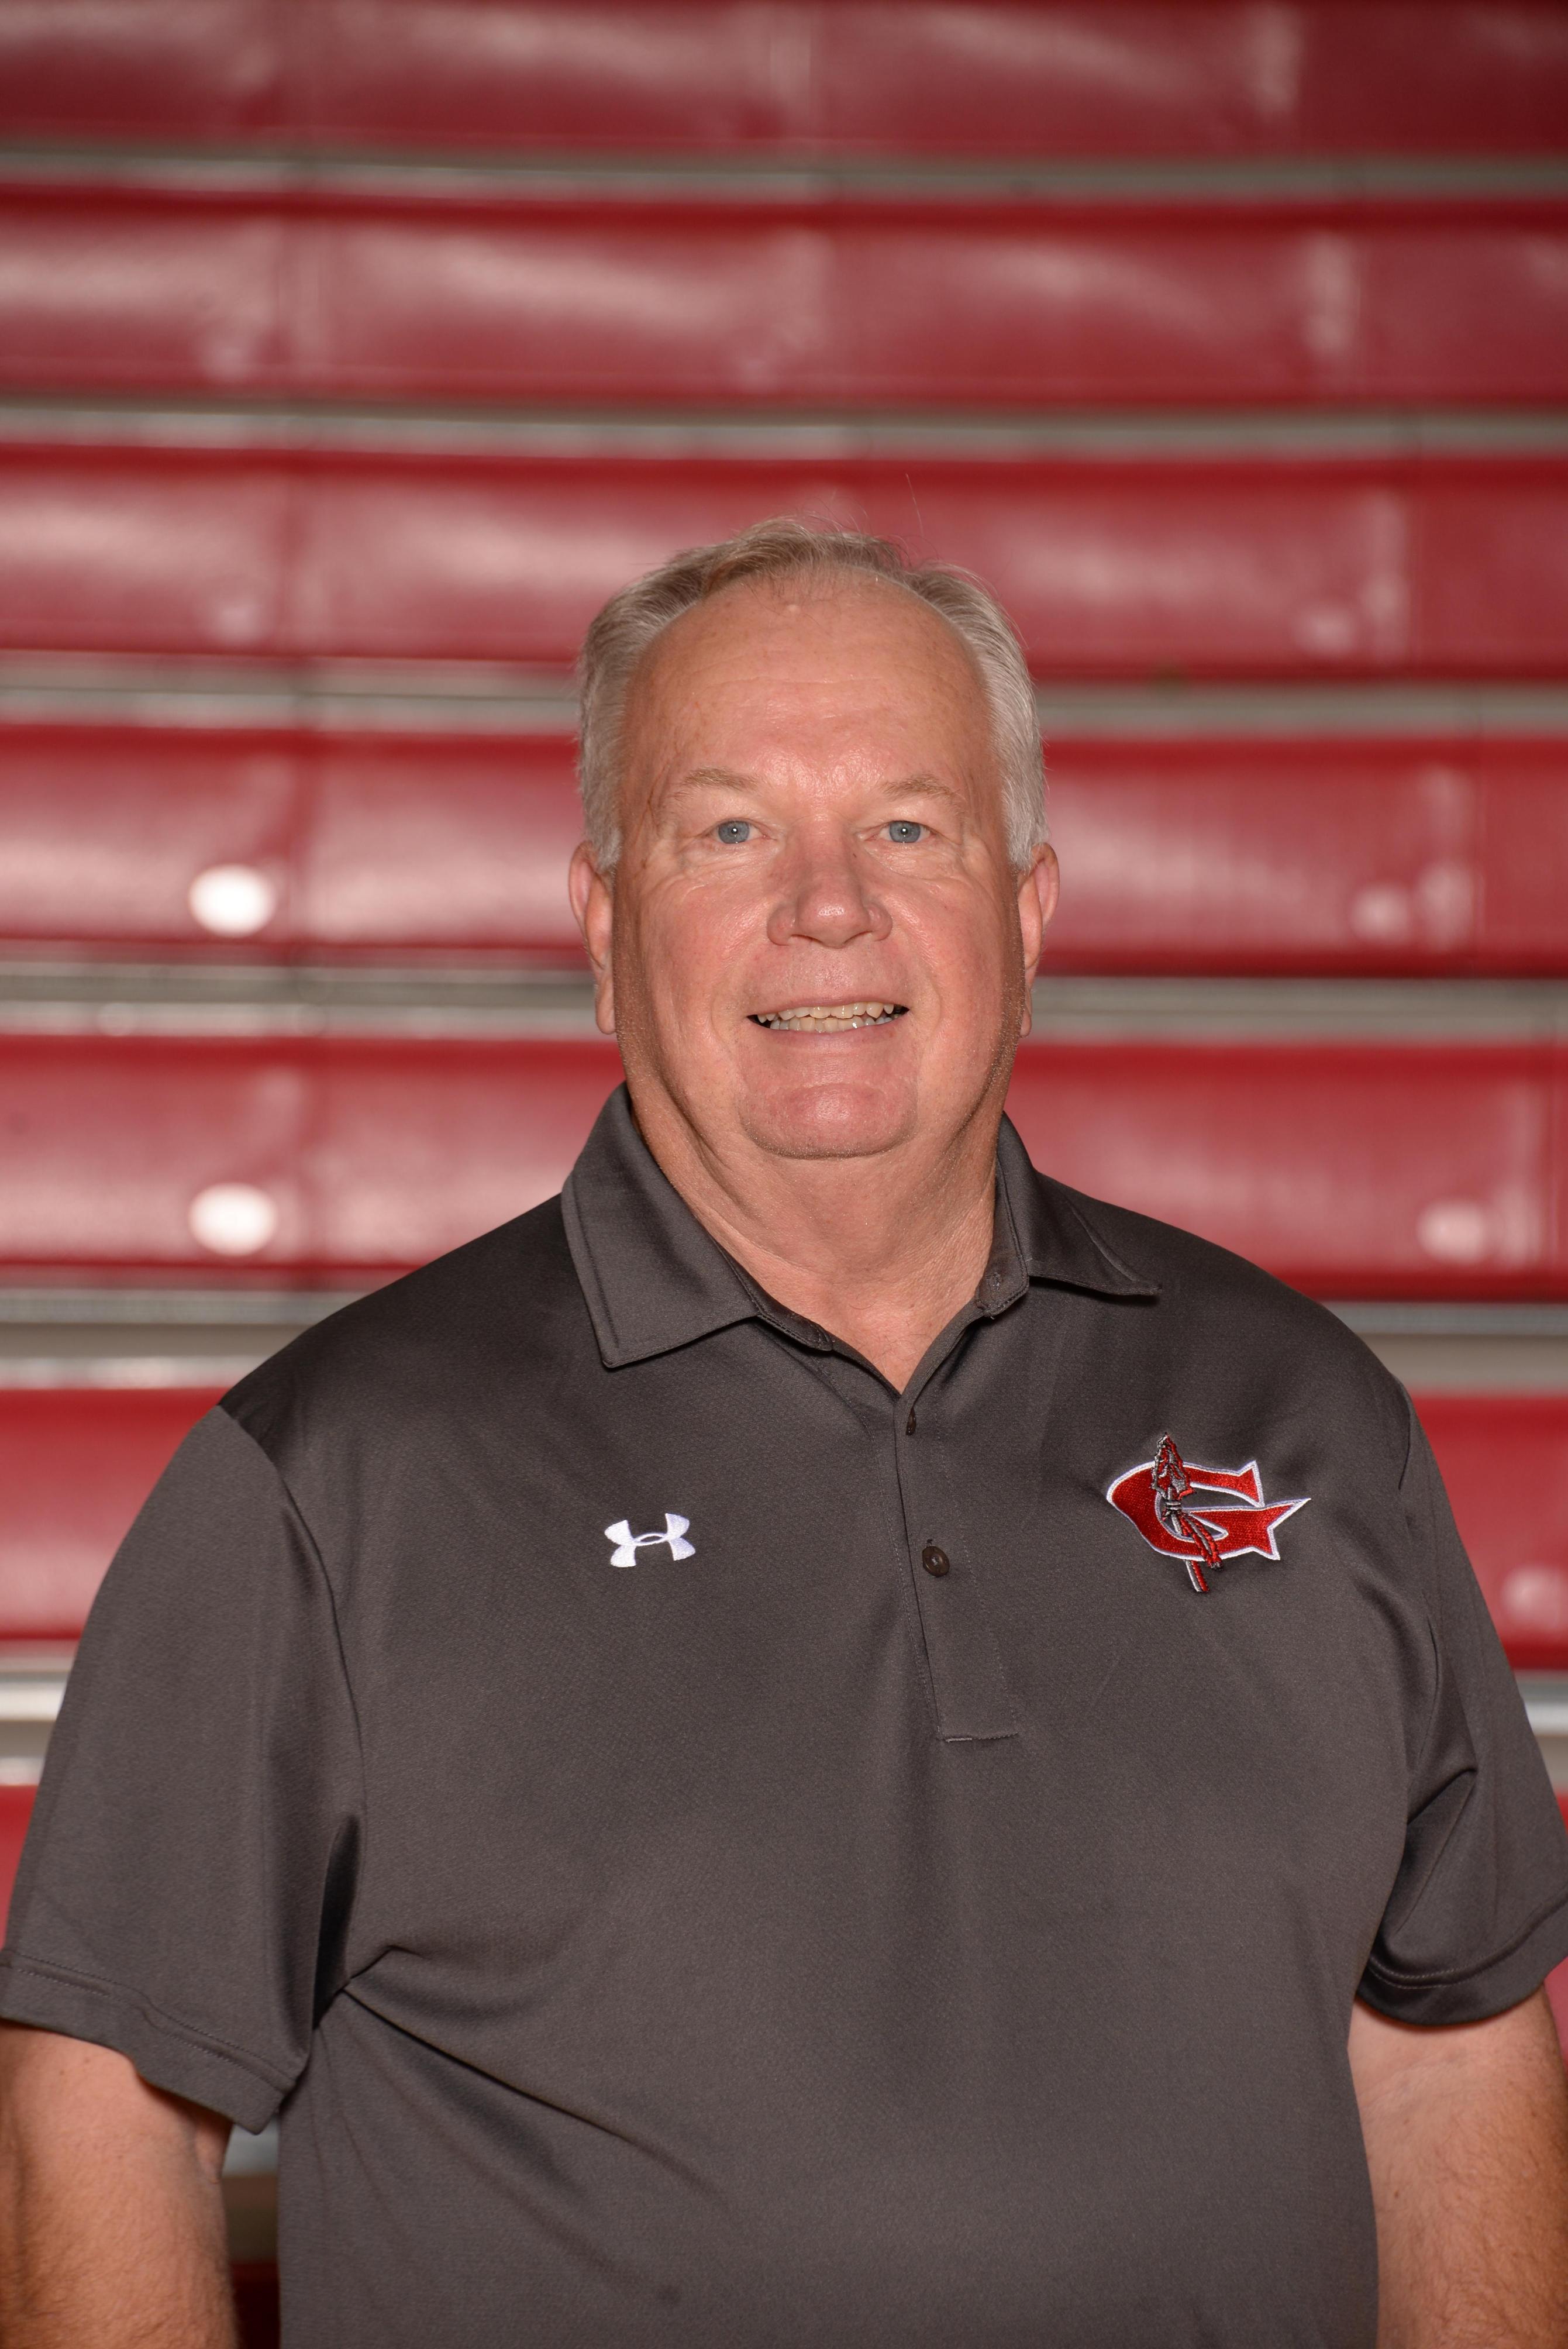 Coach Gary Couch